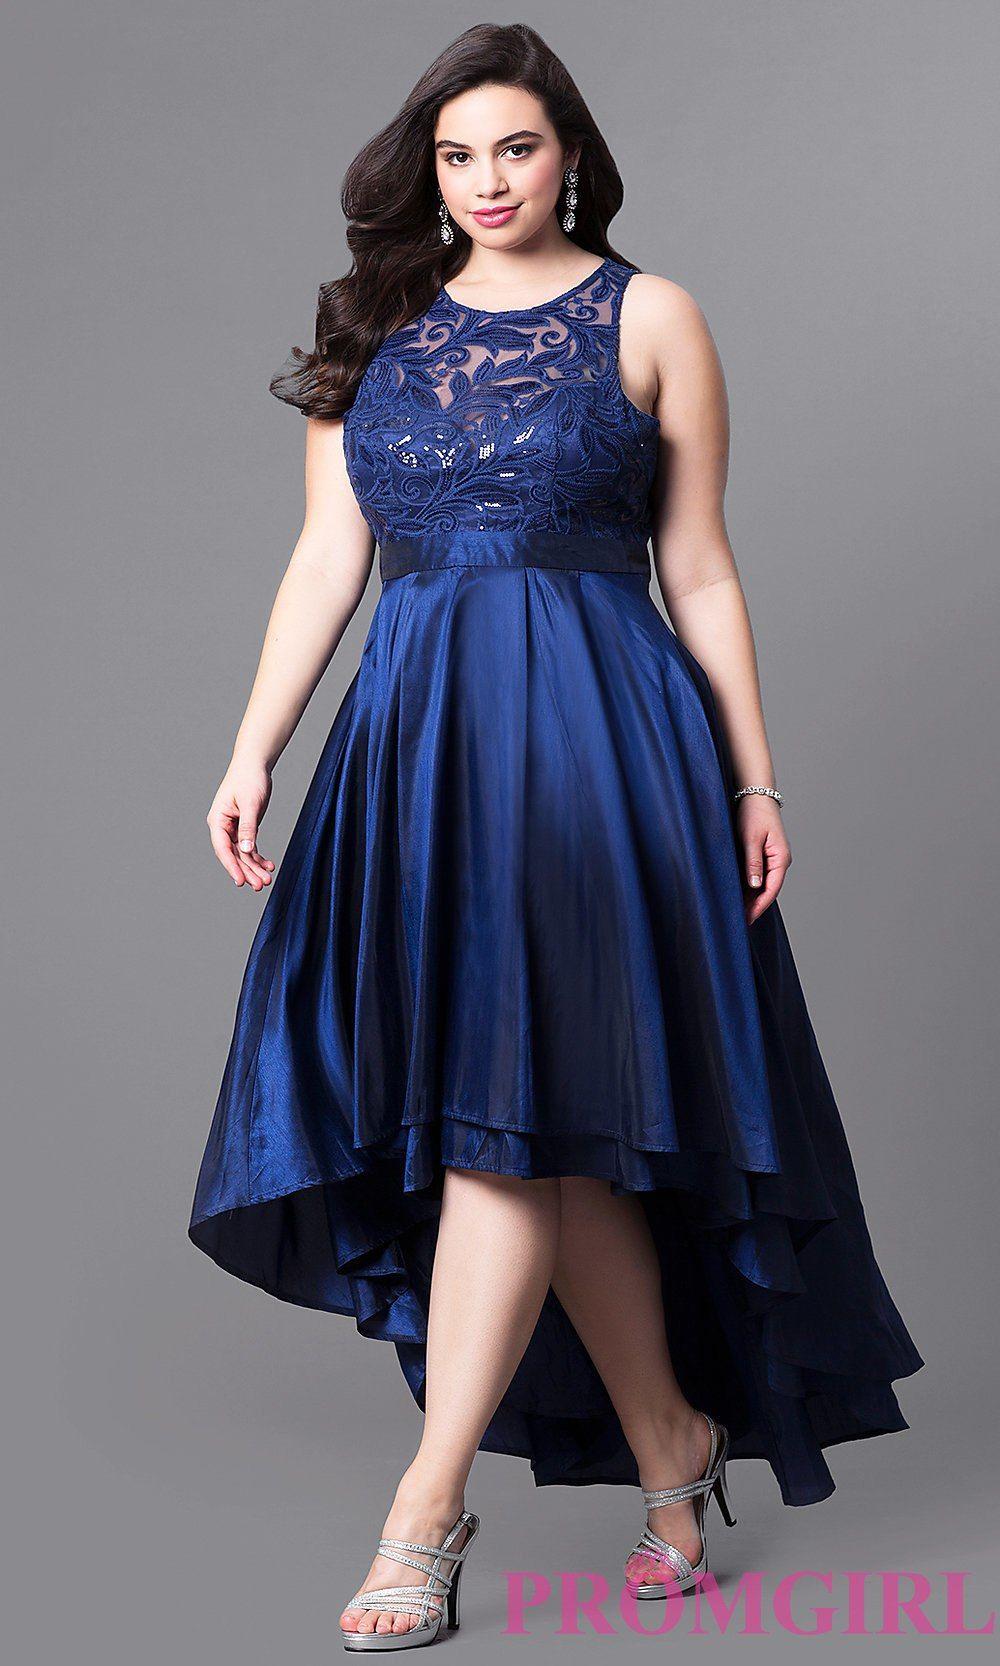 Illusionlace highlow plussize prom dresspromgirl vestido de